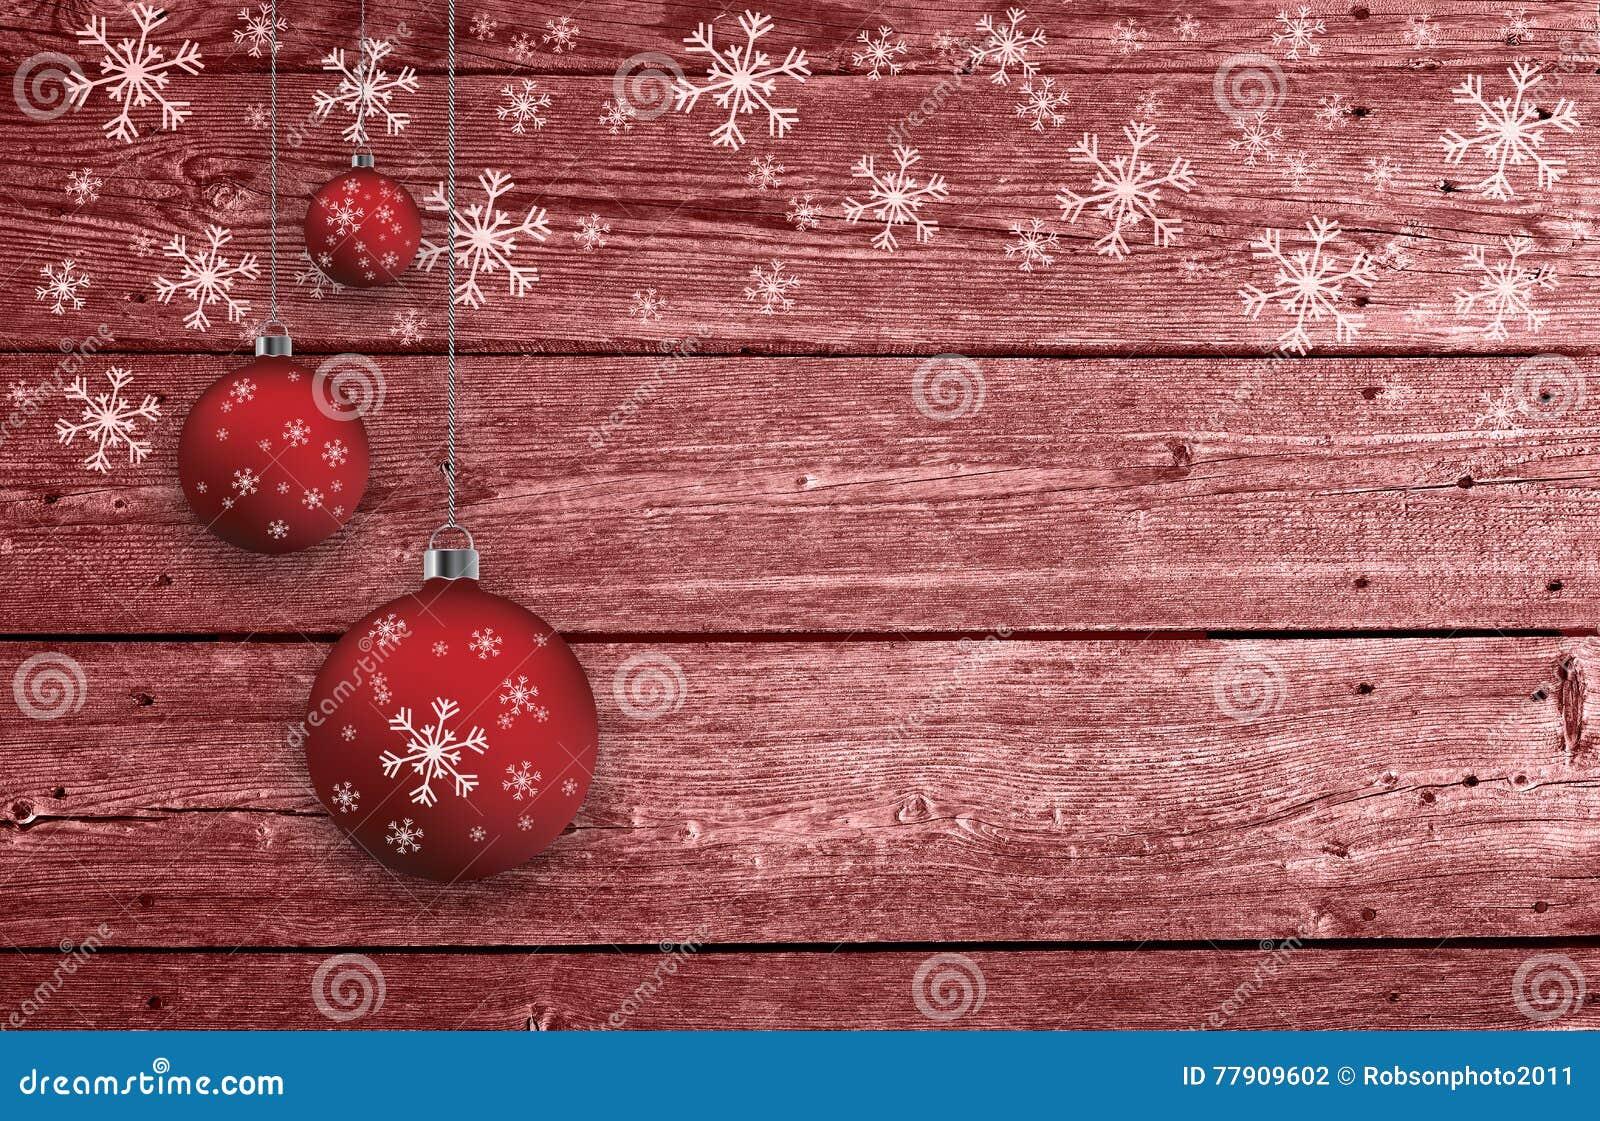 Xmas Bulbs Set Decoration On Wooden Background Stock Photo ...